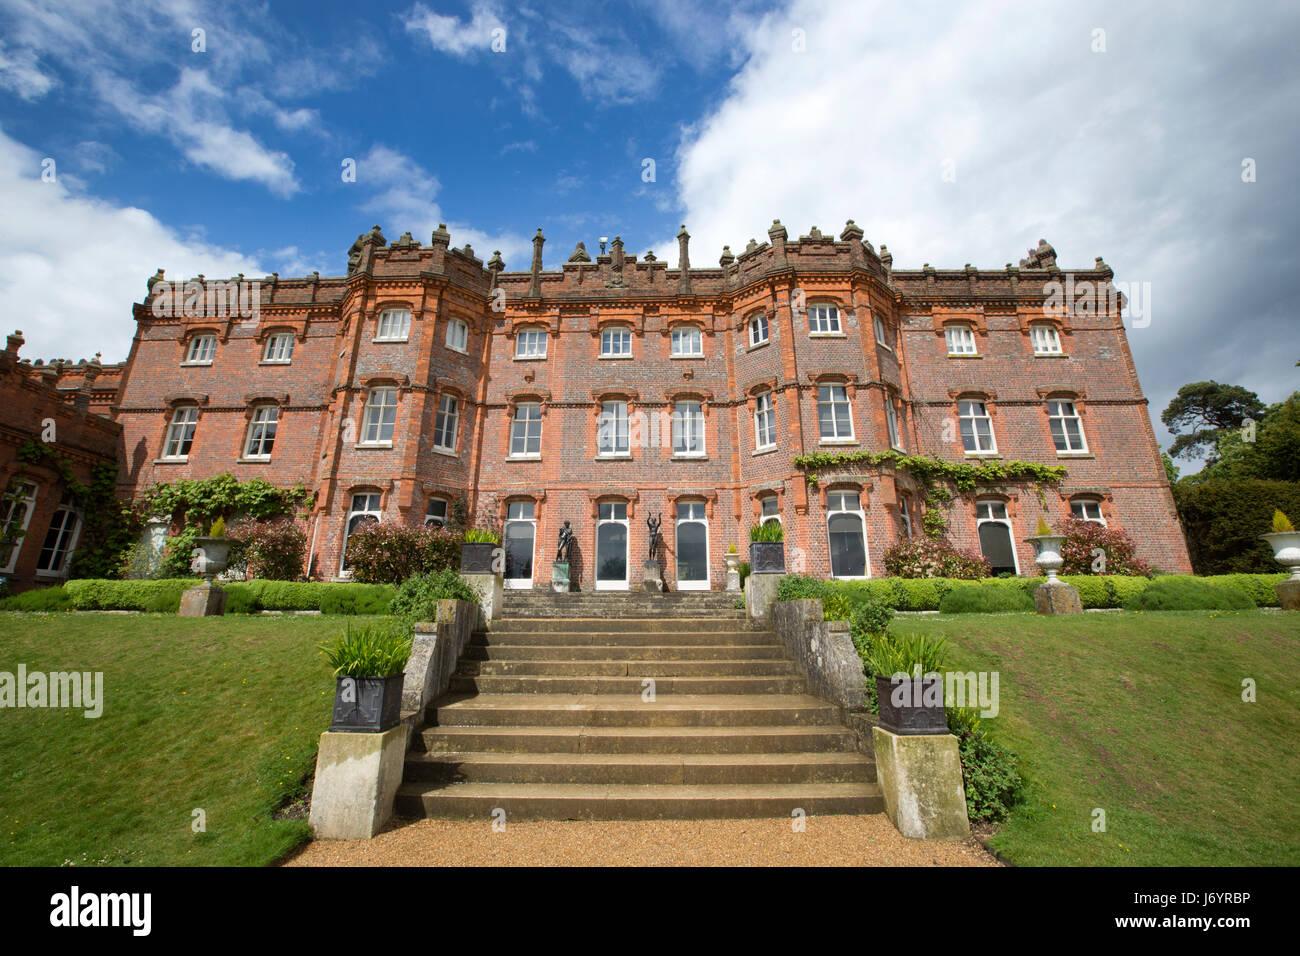 Hughenden Manor, the former home of Benjamin Disraeli, located in High Wycombe, Buckinghamshire, England, UK - Stock Image